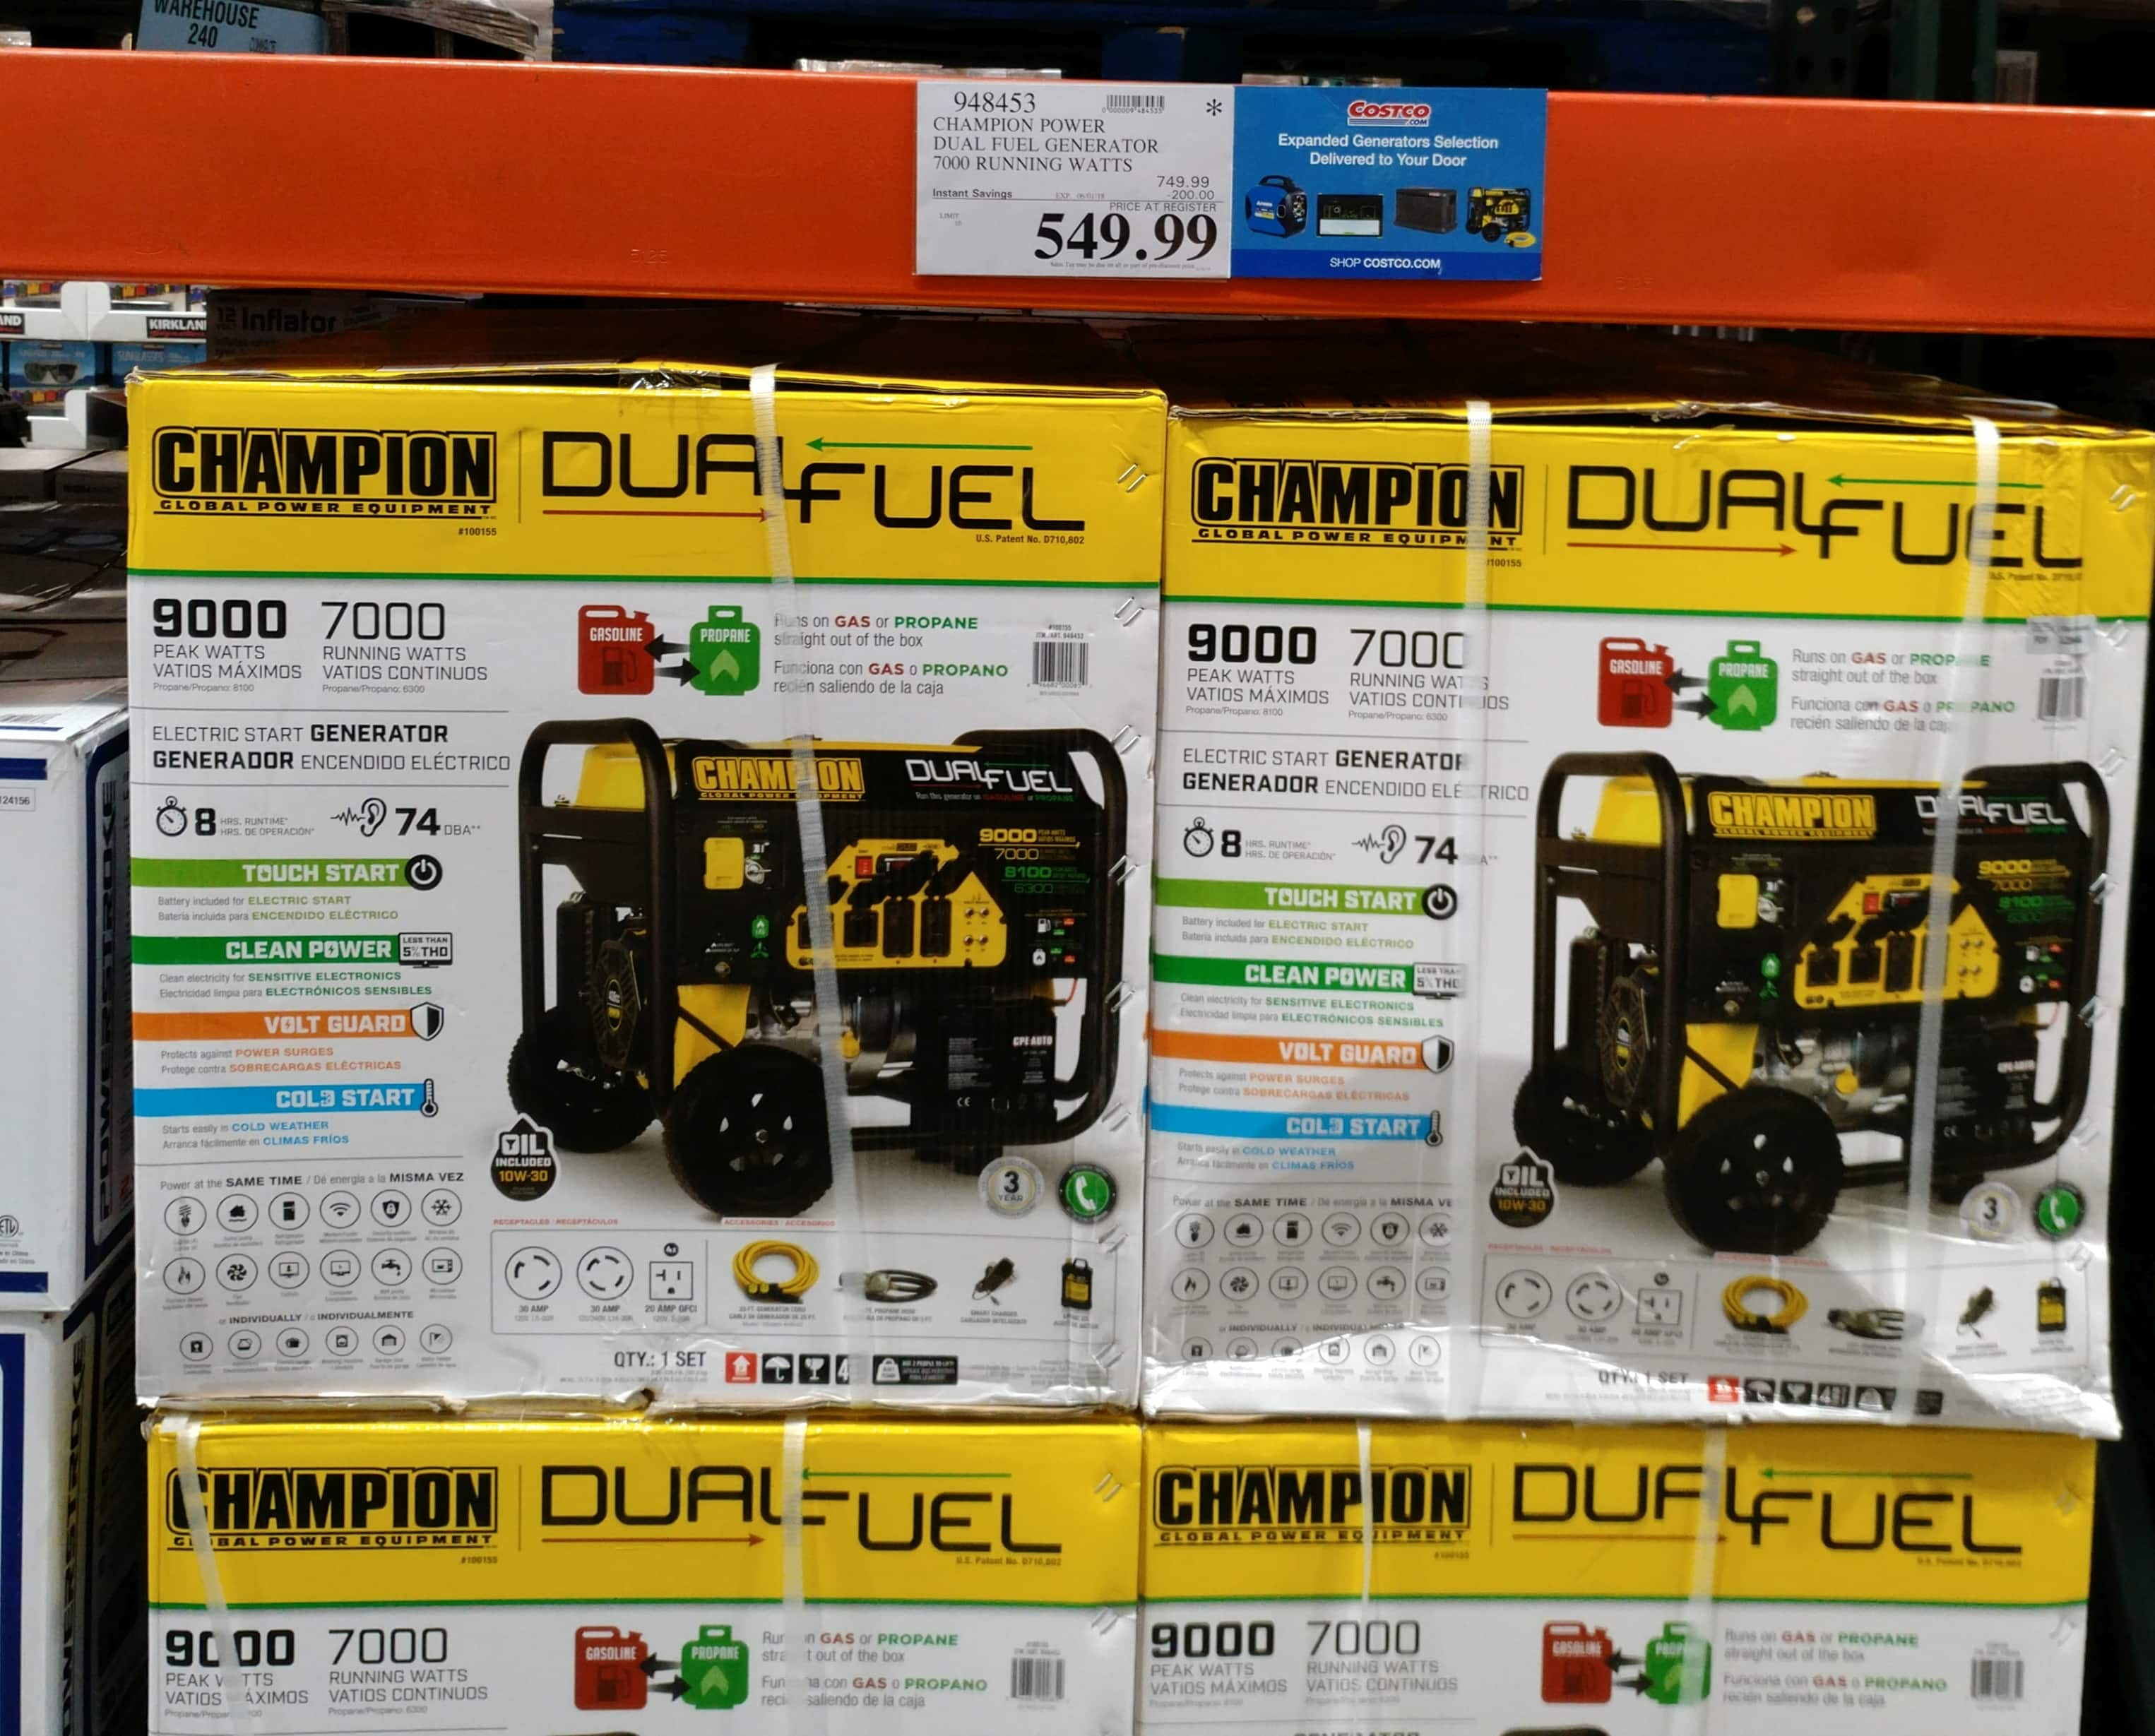 Champion 7000W Dual Fuel Generator with 25' 30 Amp Cord $549.99 Costco B&M